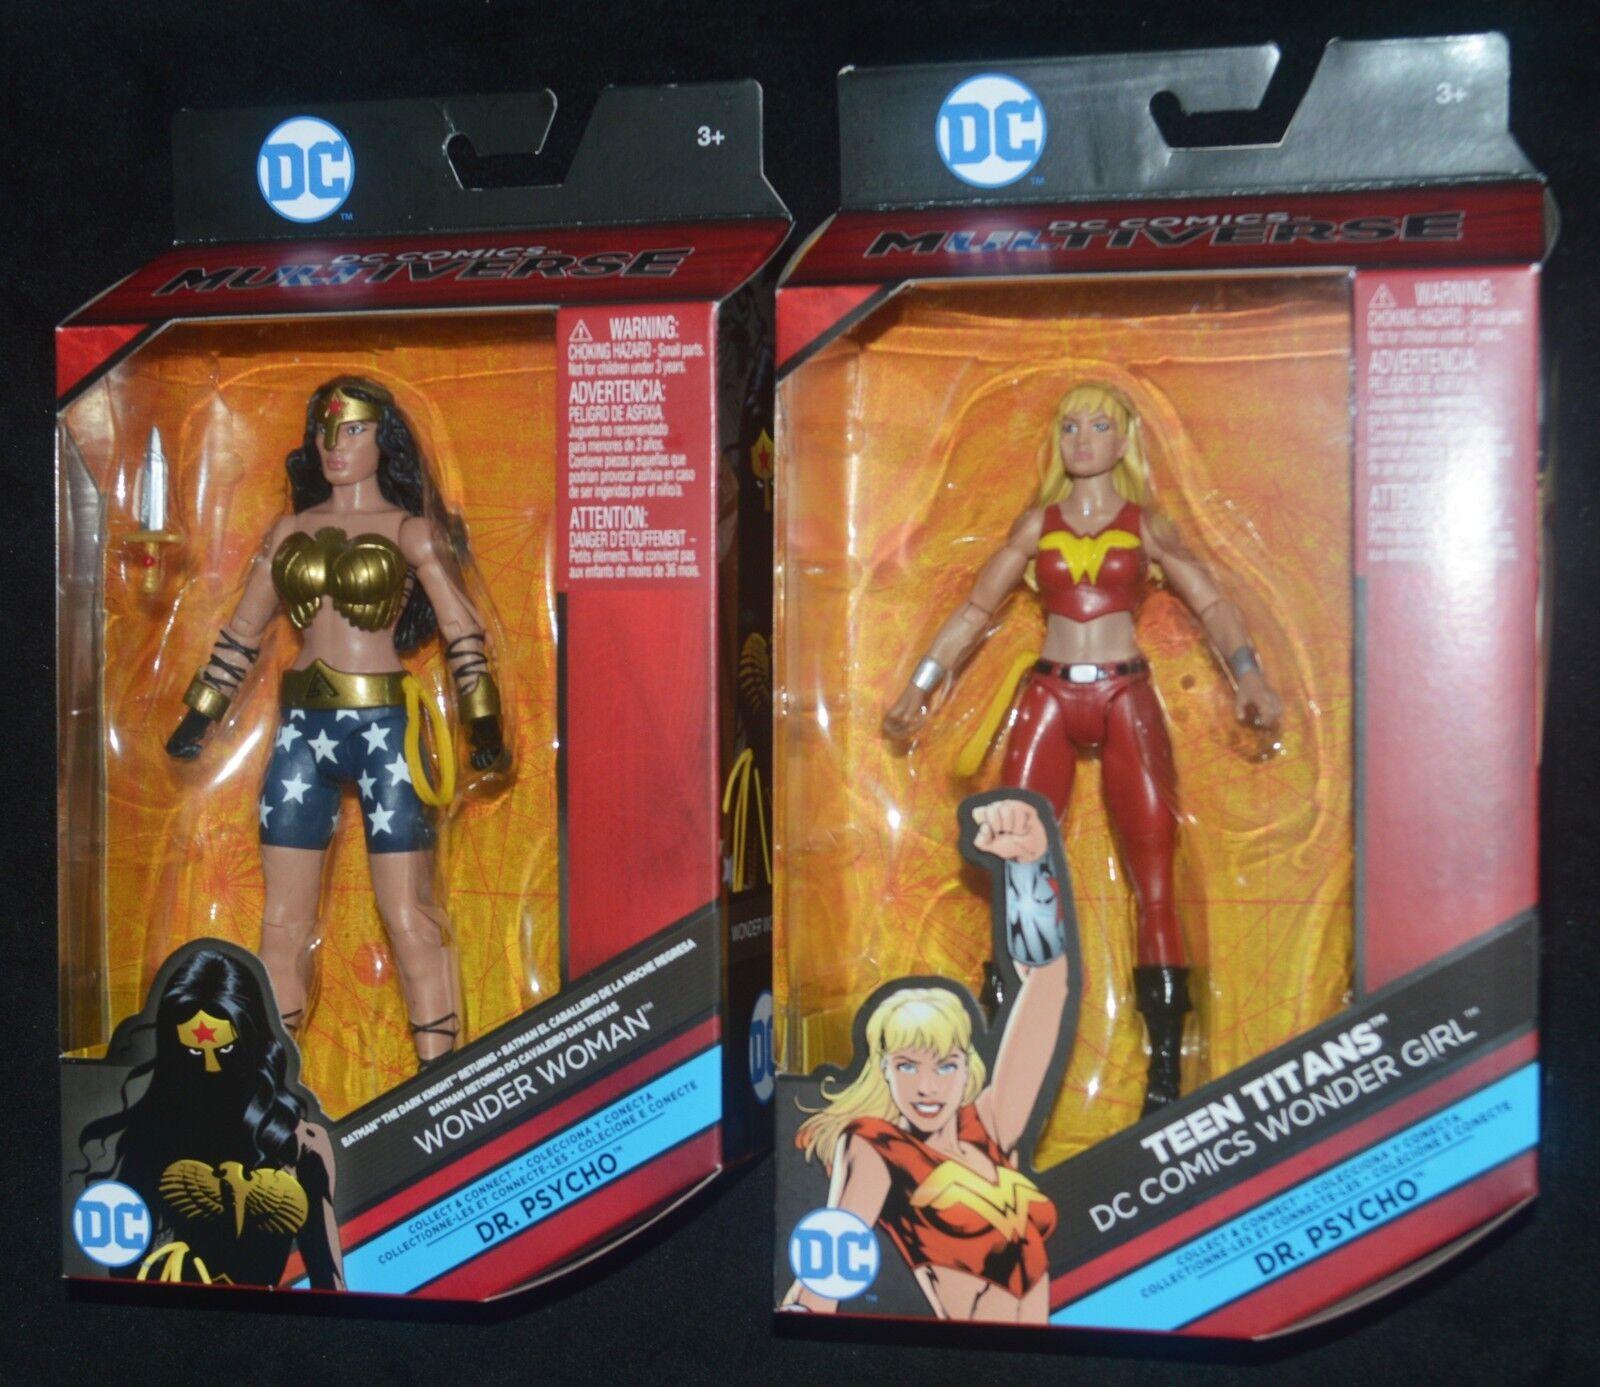 WONDER Damenschuhe & WONDER GIRL Dr. Psycho BAF Series DC Multiverse Teen Titans MIP